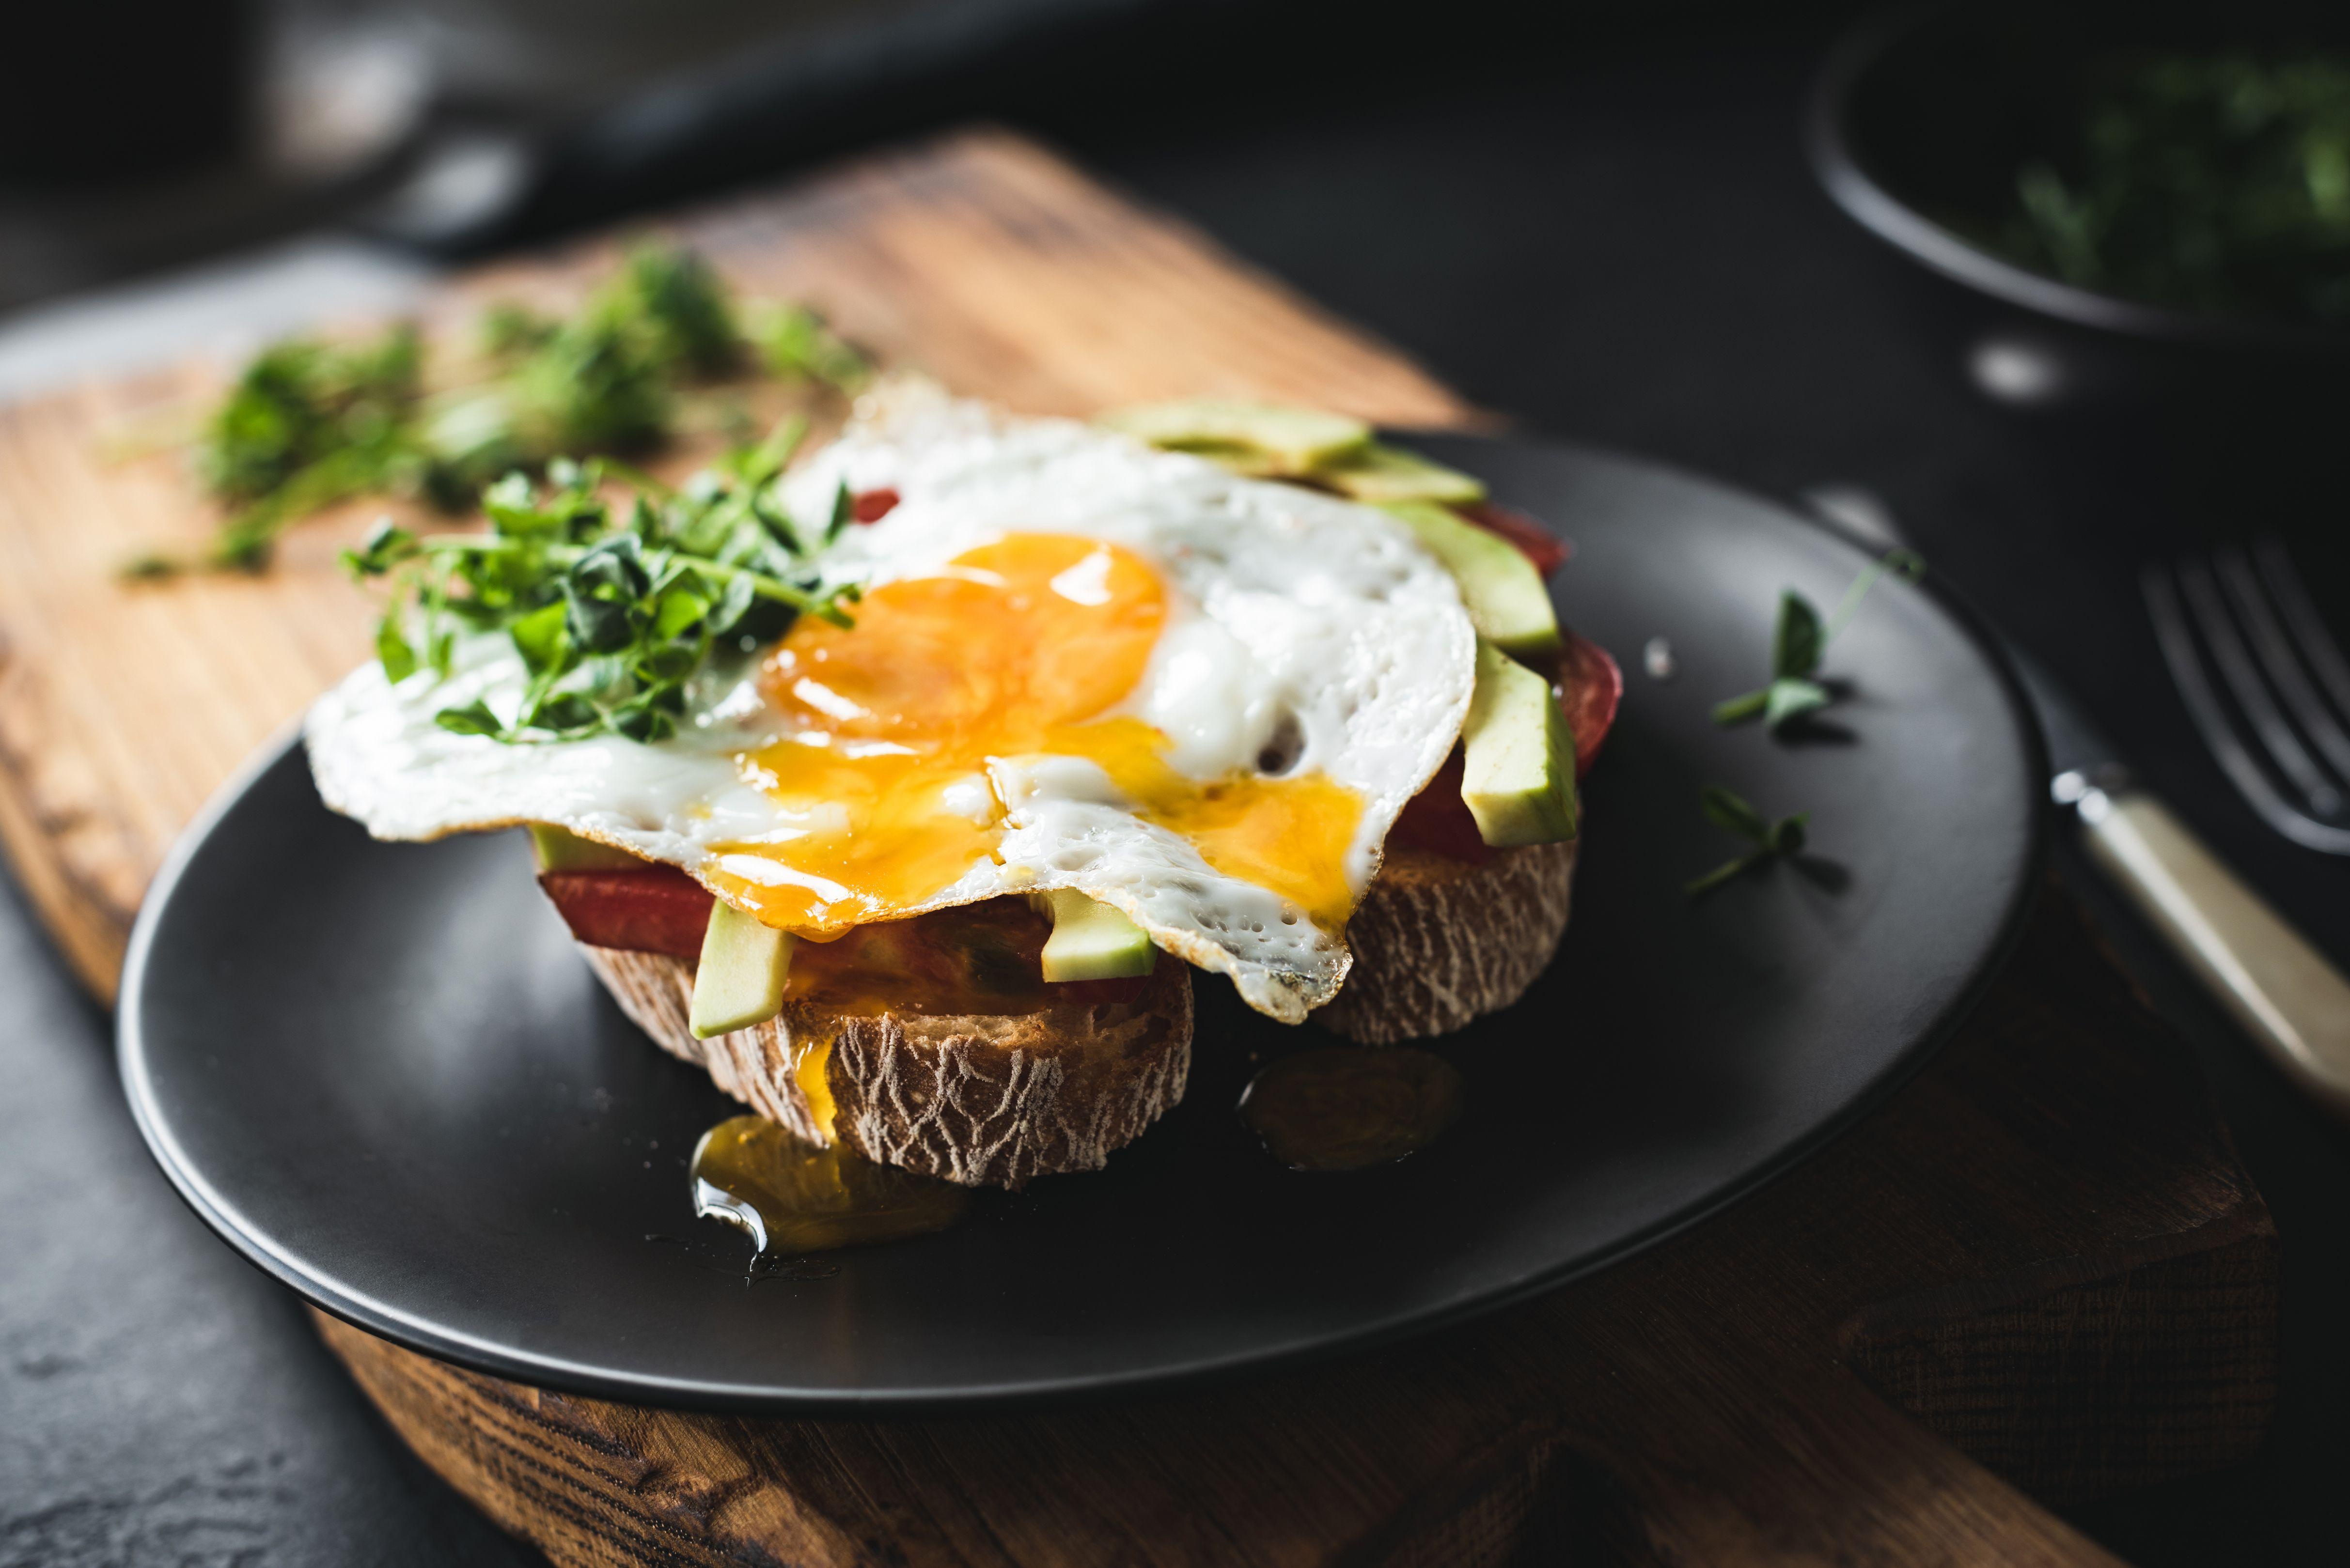 Huevo, ¿dentro o fuera de la nevera?